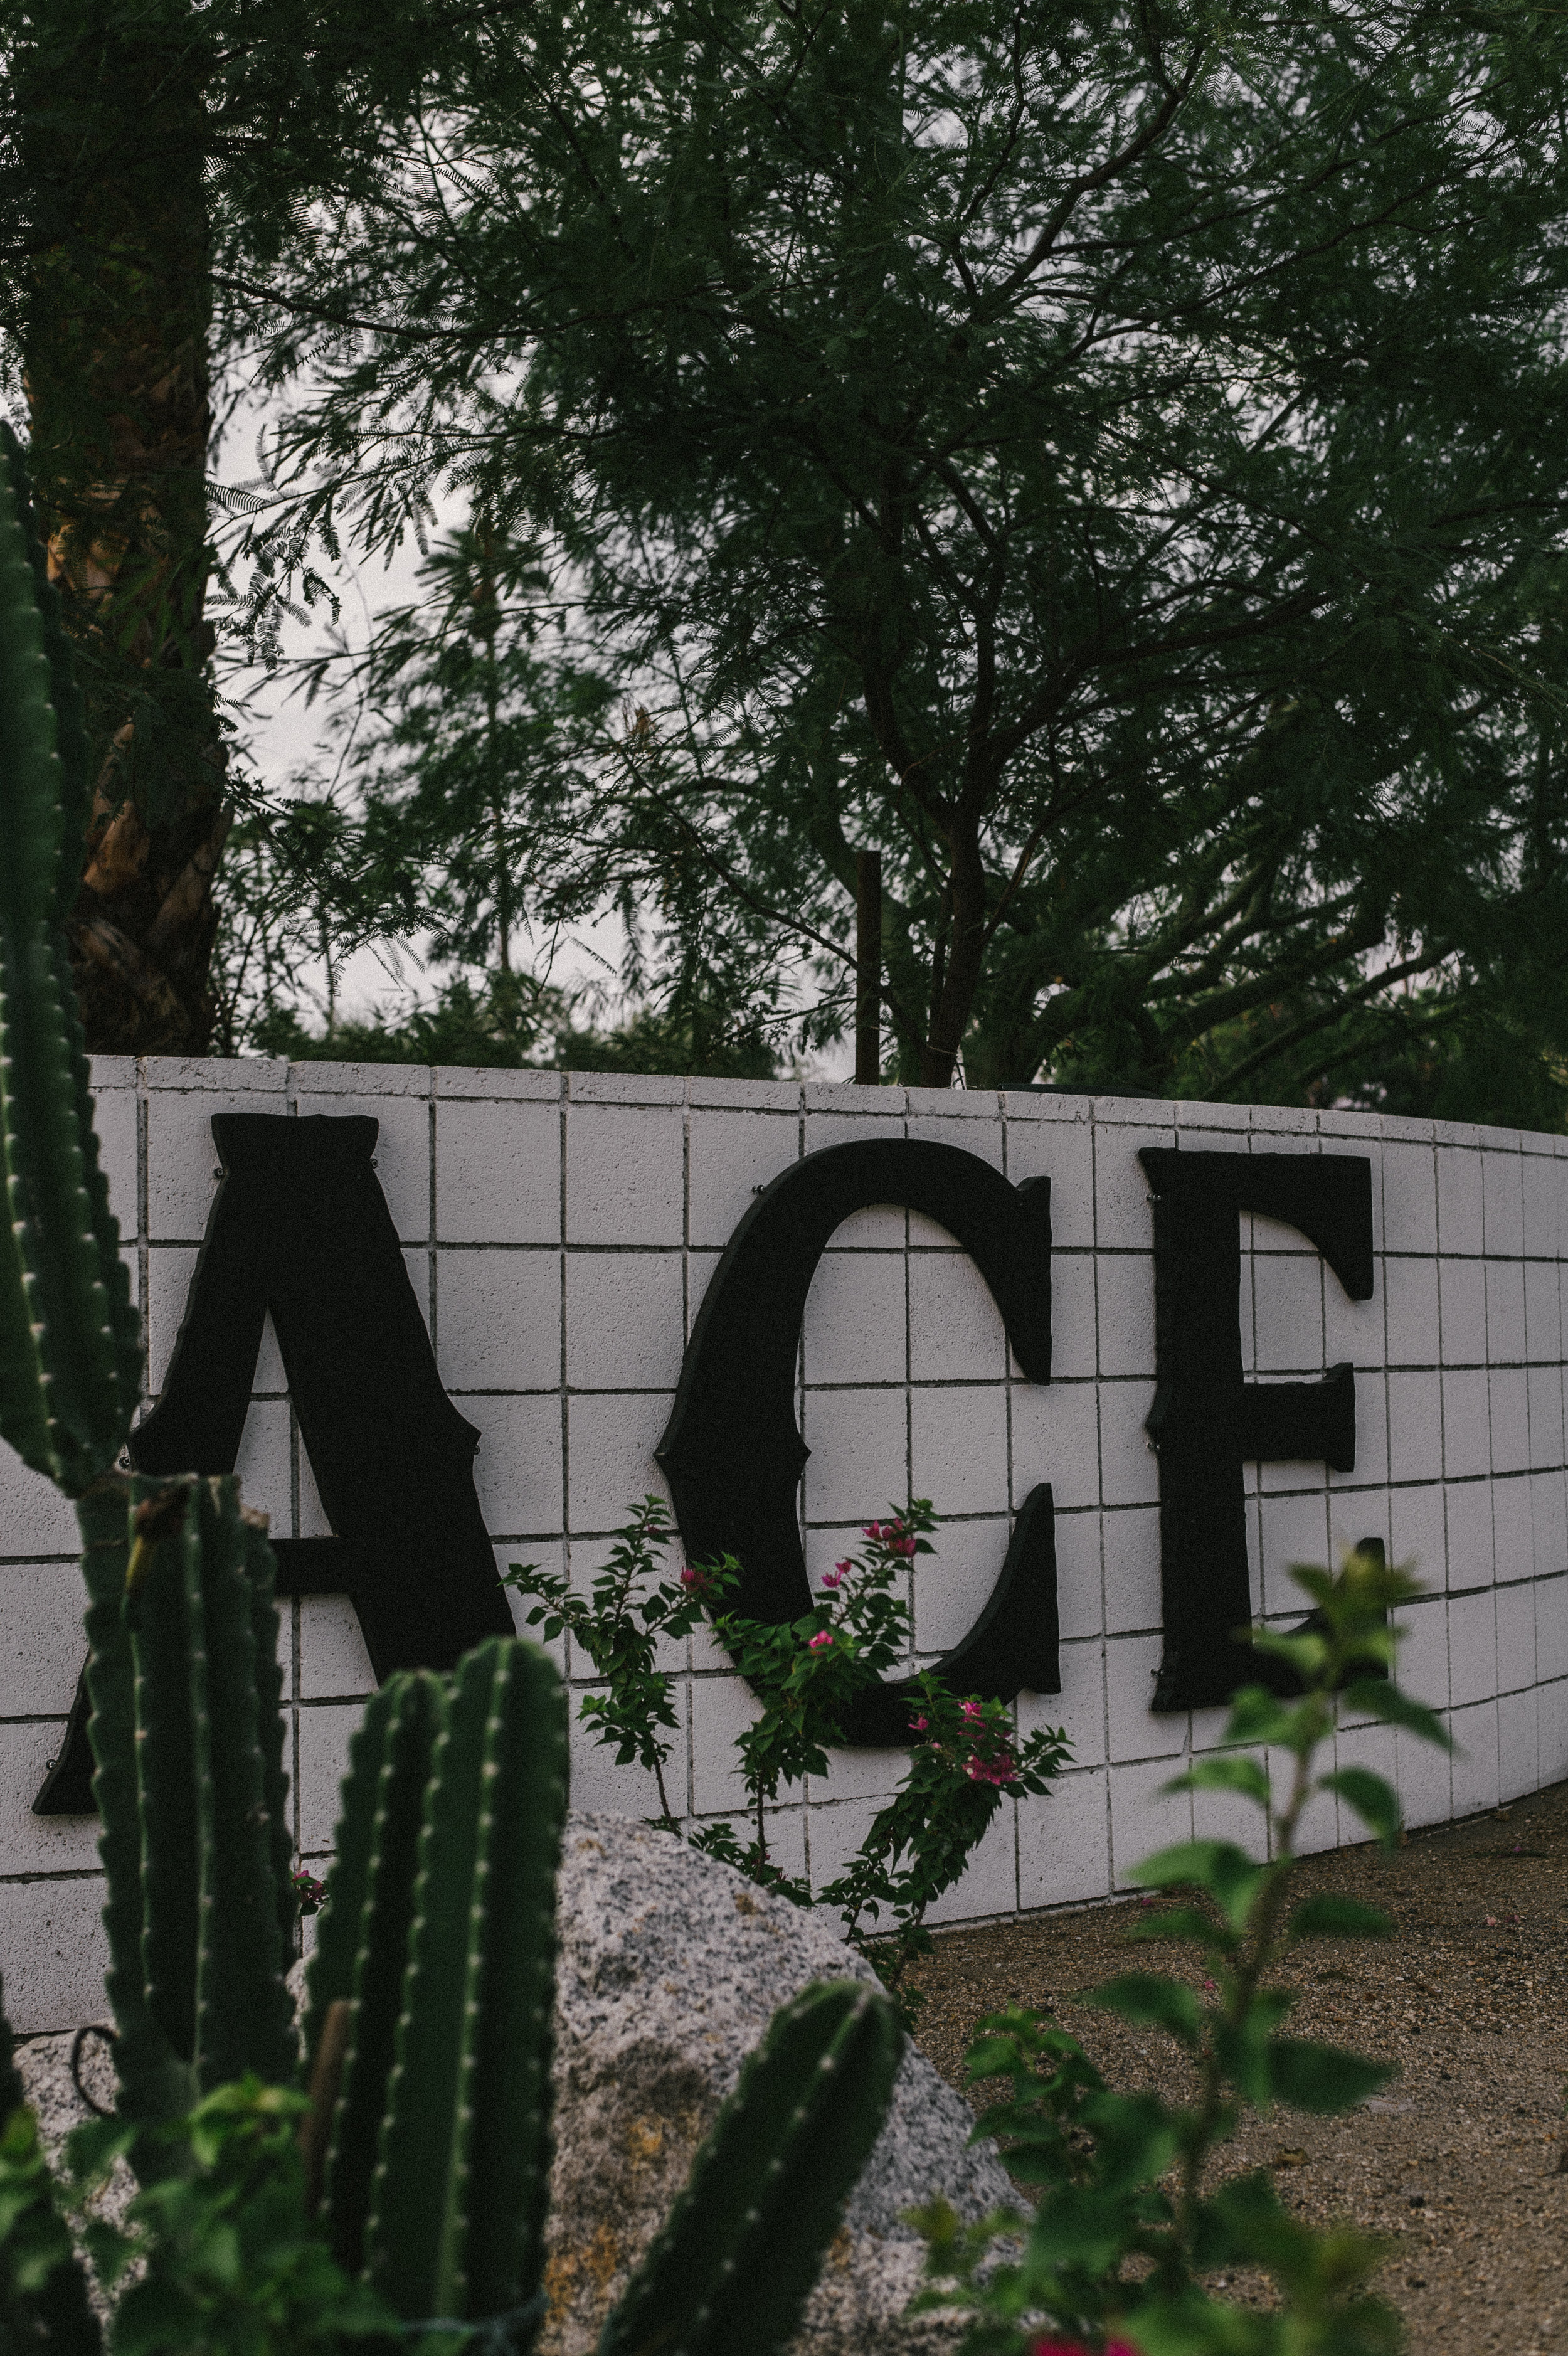 The-Glossier-Ace-Hotel-Palm-Springs-CA-37.jpg